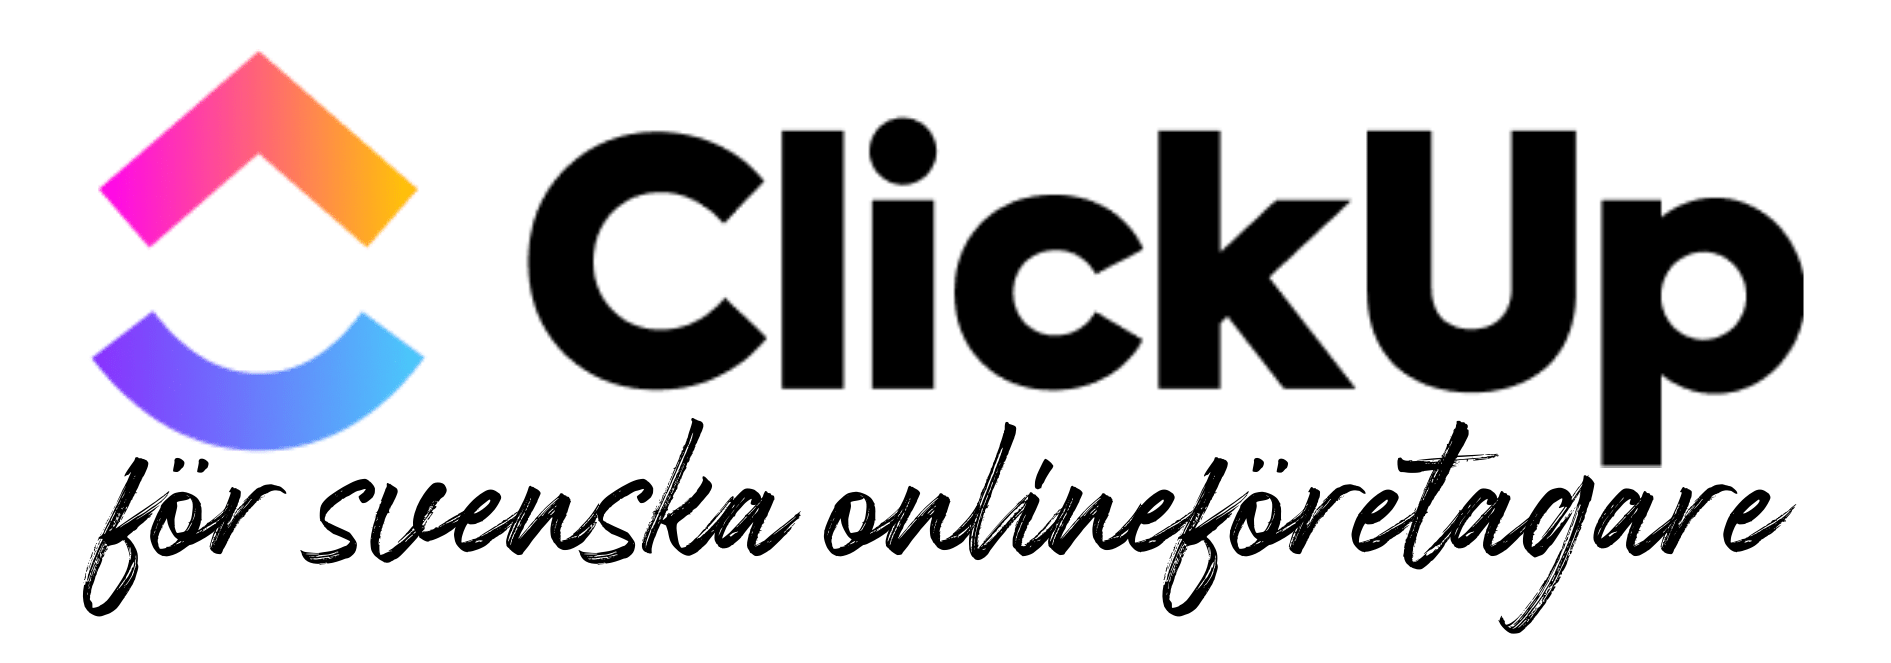 ClickUp 1920x1080 (1)